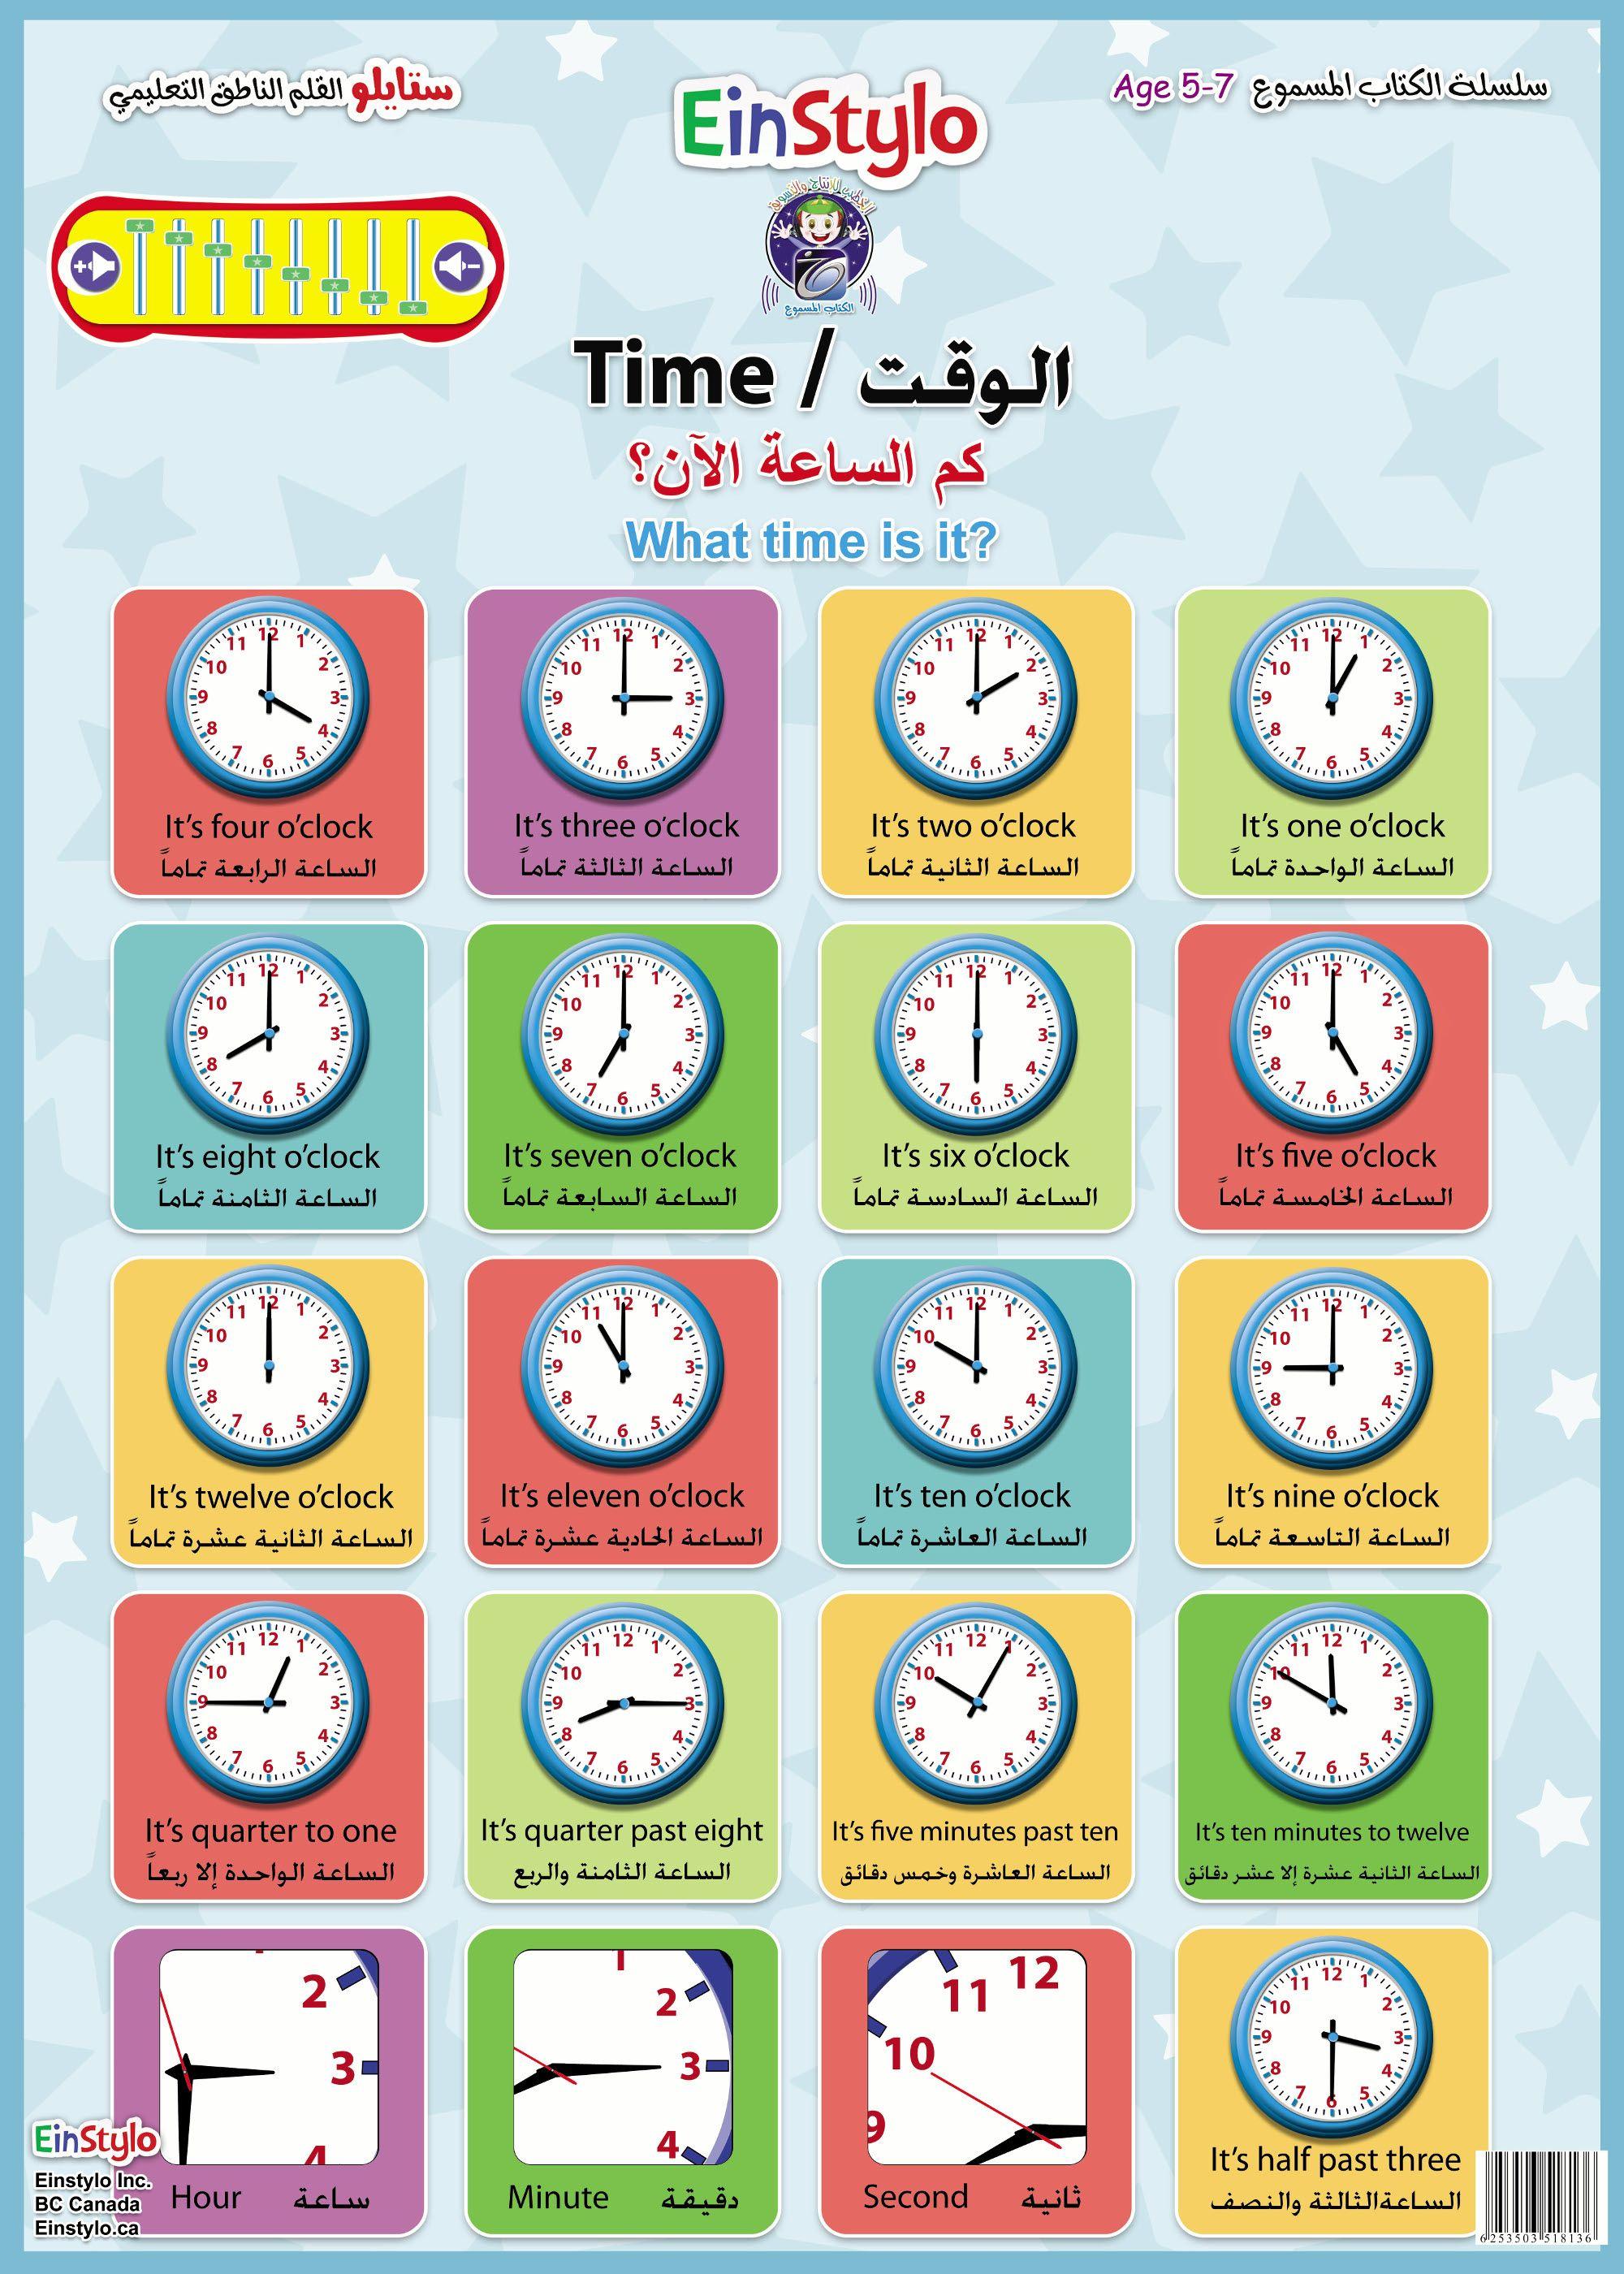 4bd988141 كم # الساعة الآن ؟ شاركنا متعة # التعلم مع # آينستايلو ...